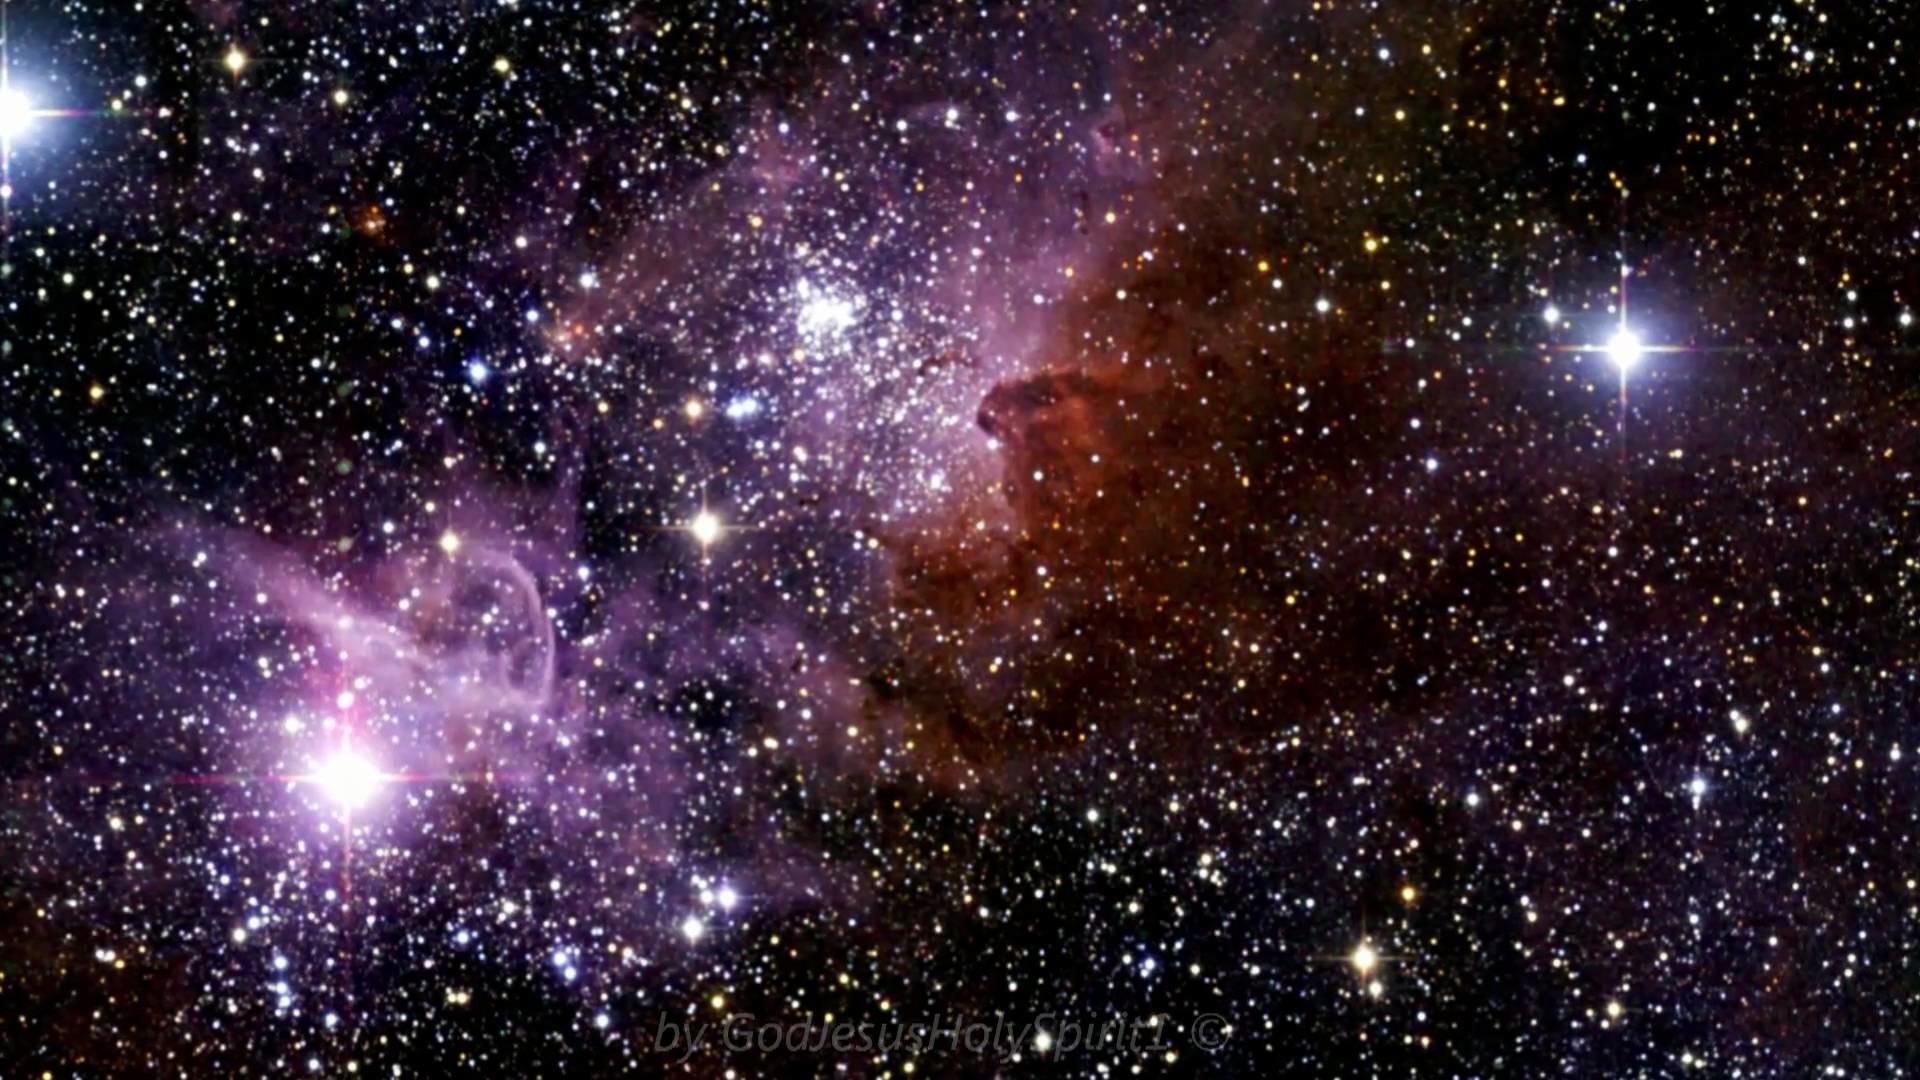 Universe hd Wallpapers 1080p Universe hd Wallpapers